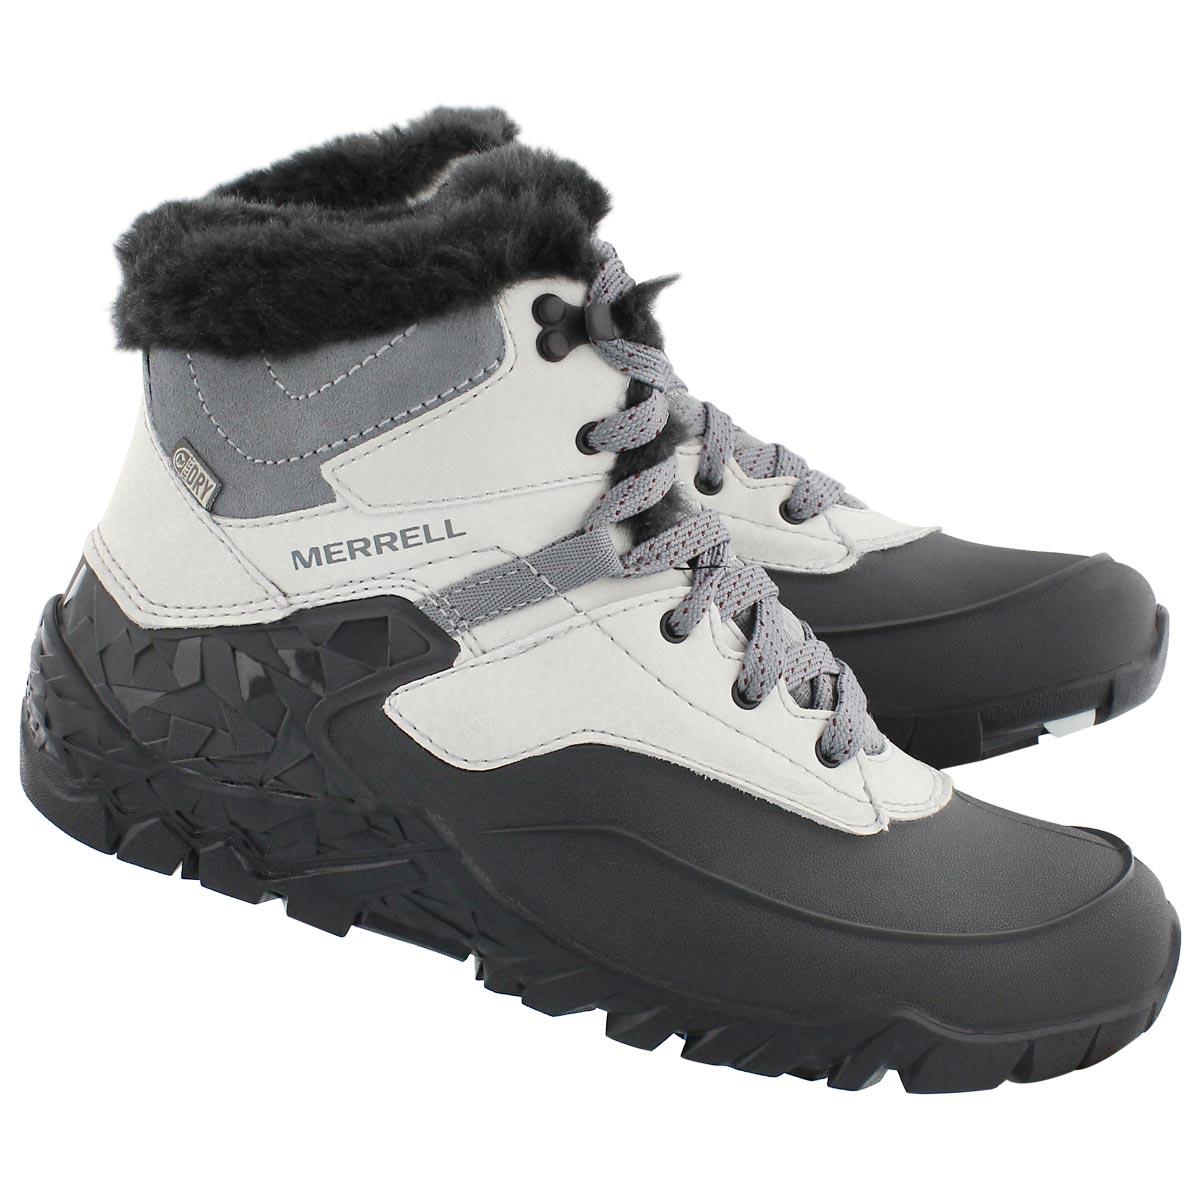 Lds Aurora 6 Ice ash wtpf winter boot